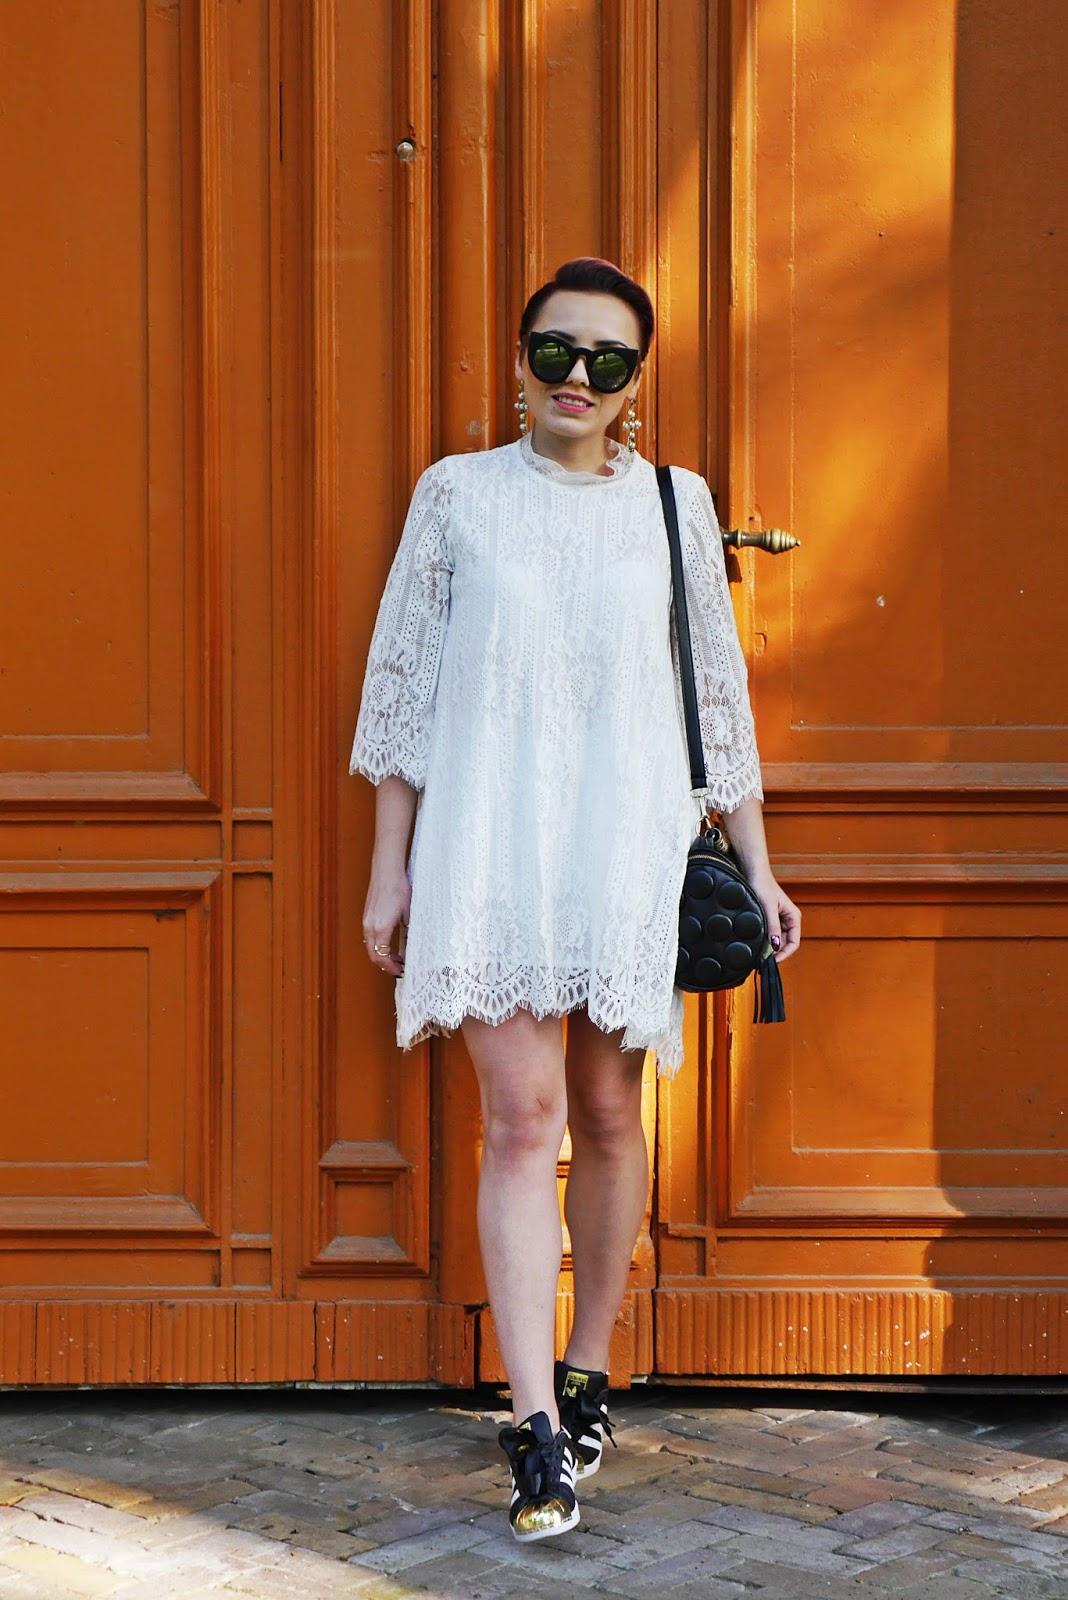 biala_sukienka_koronkowa_superstary_czarne_karyn_blog_250517b